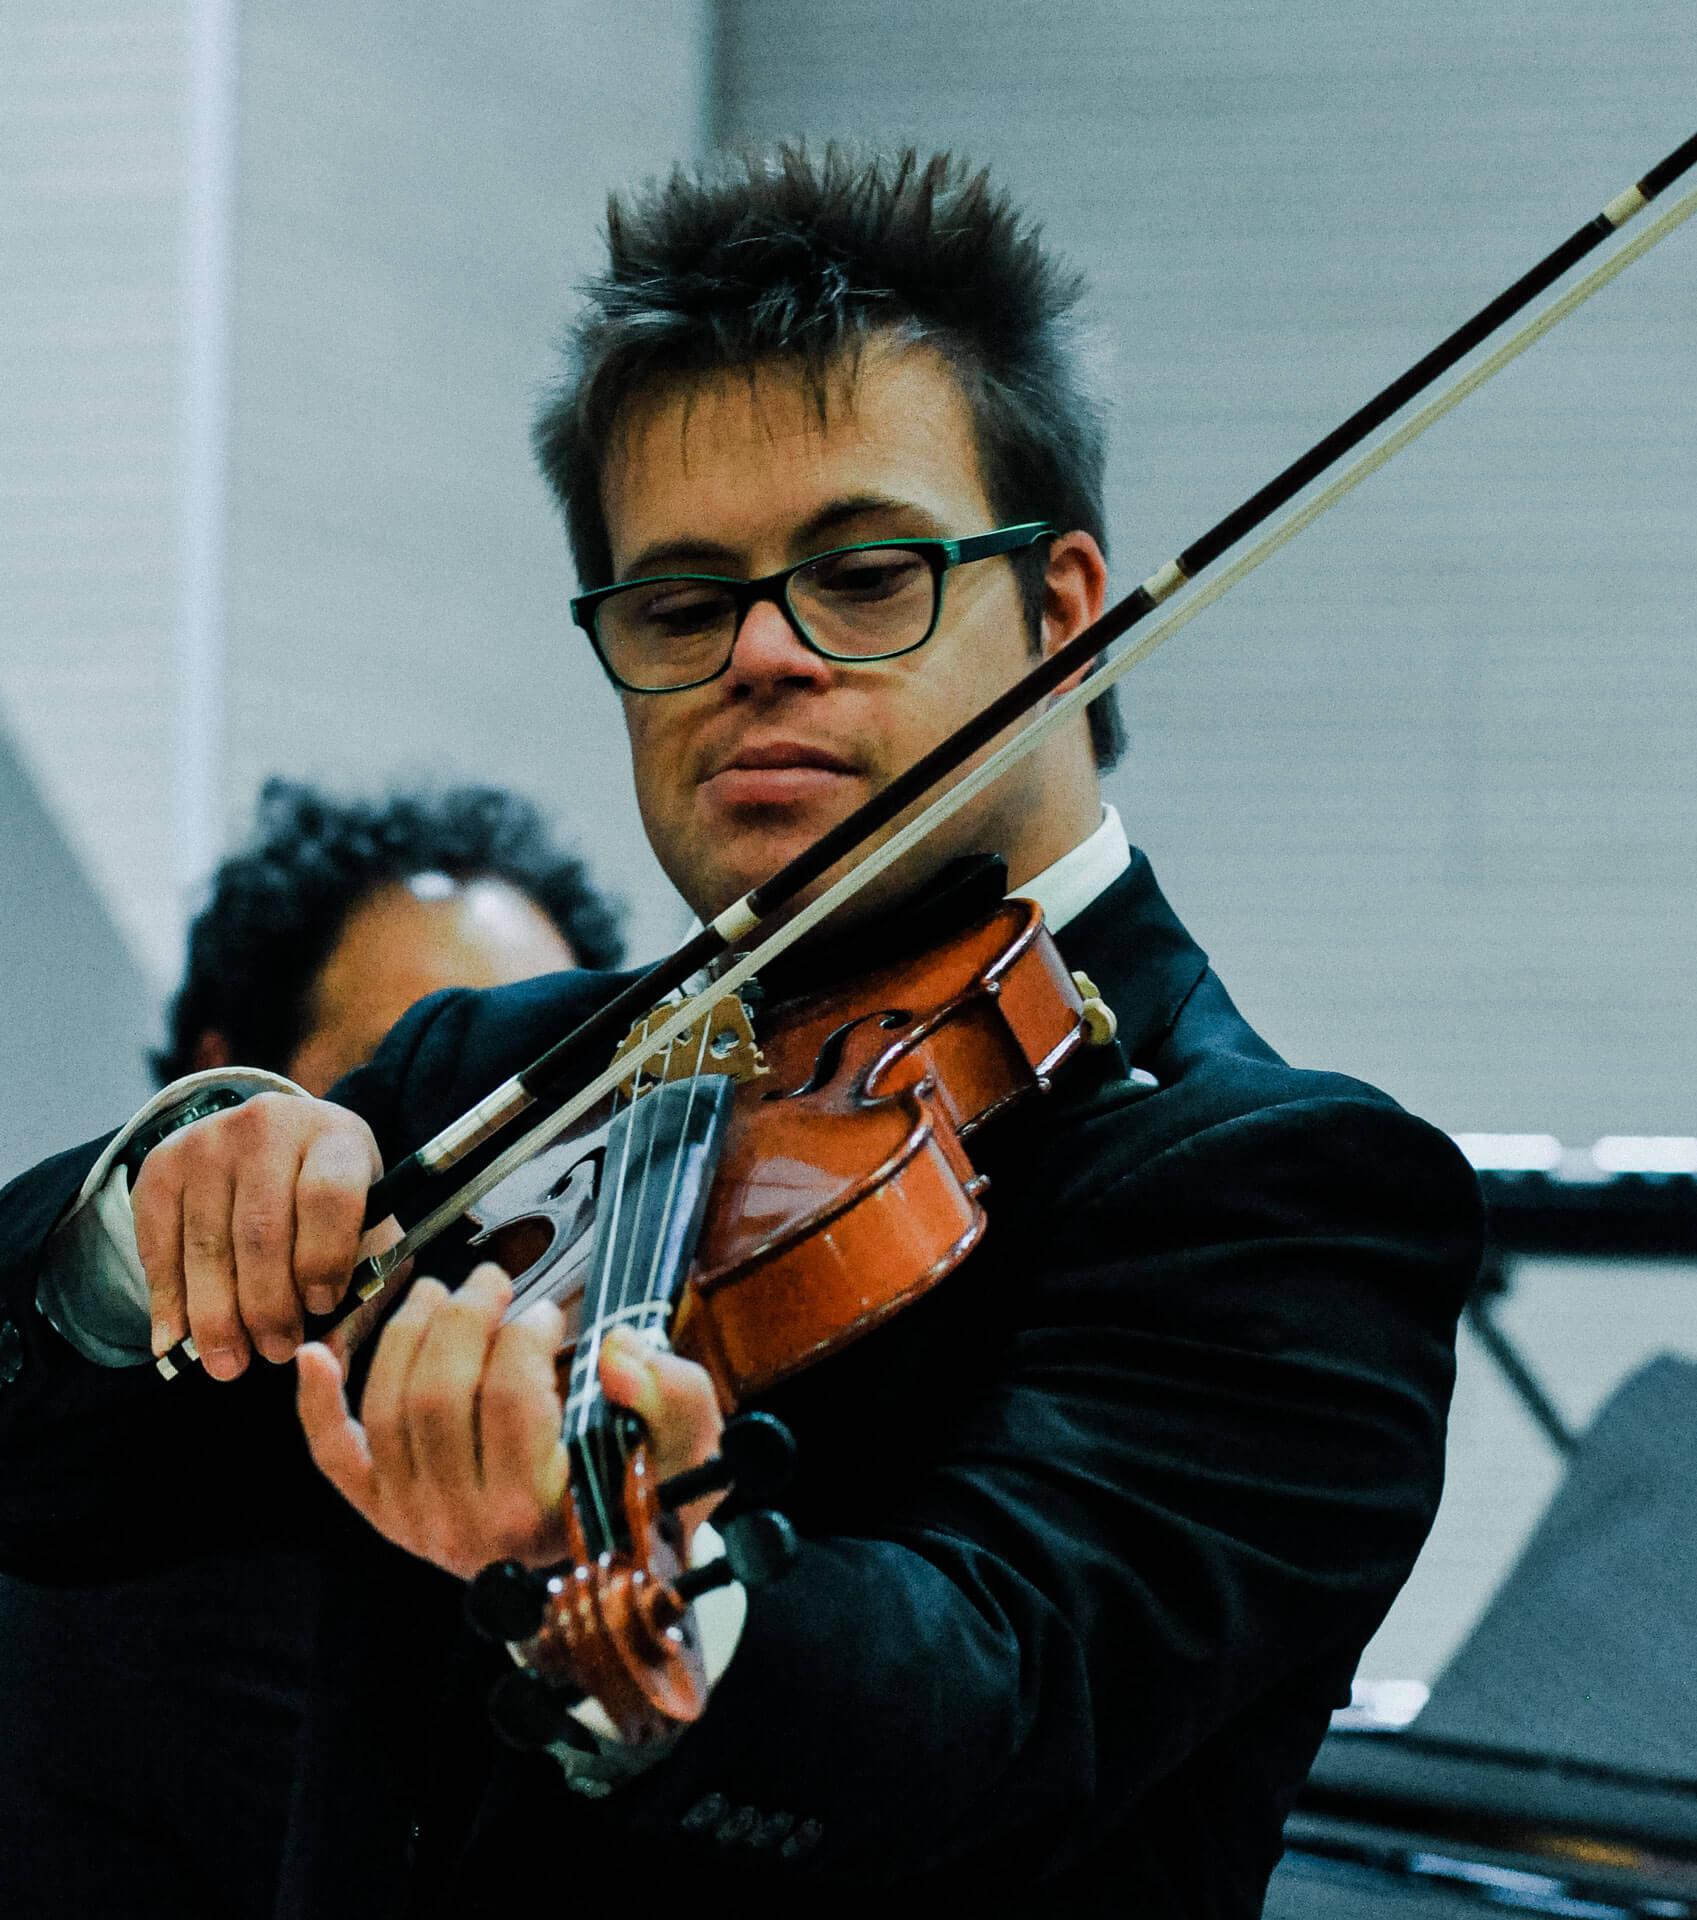 Jacopo Wiquel